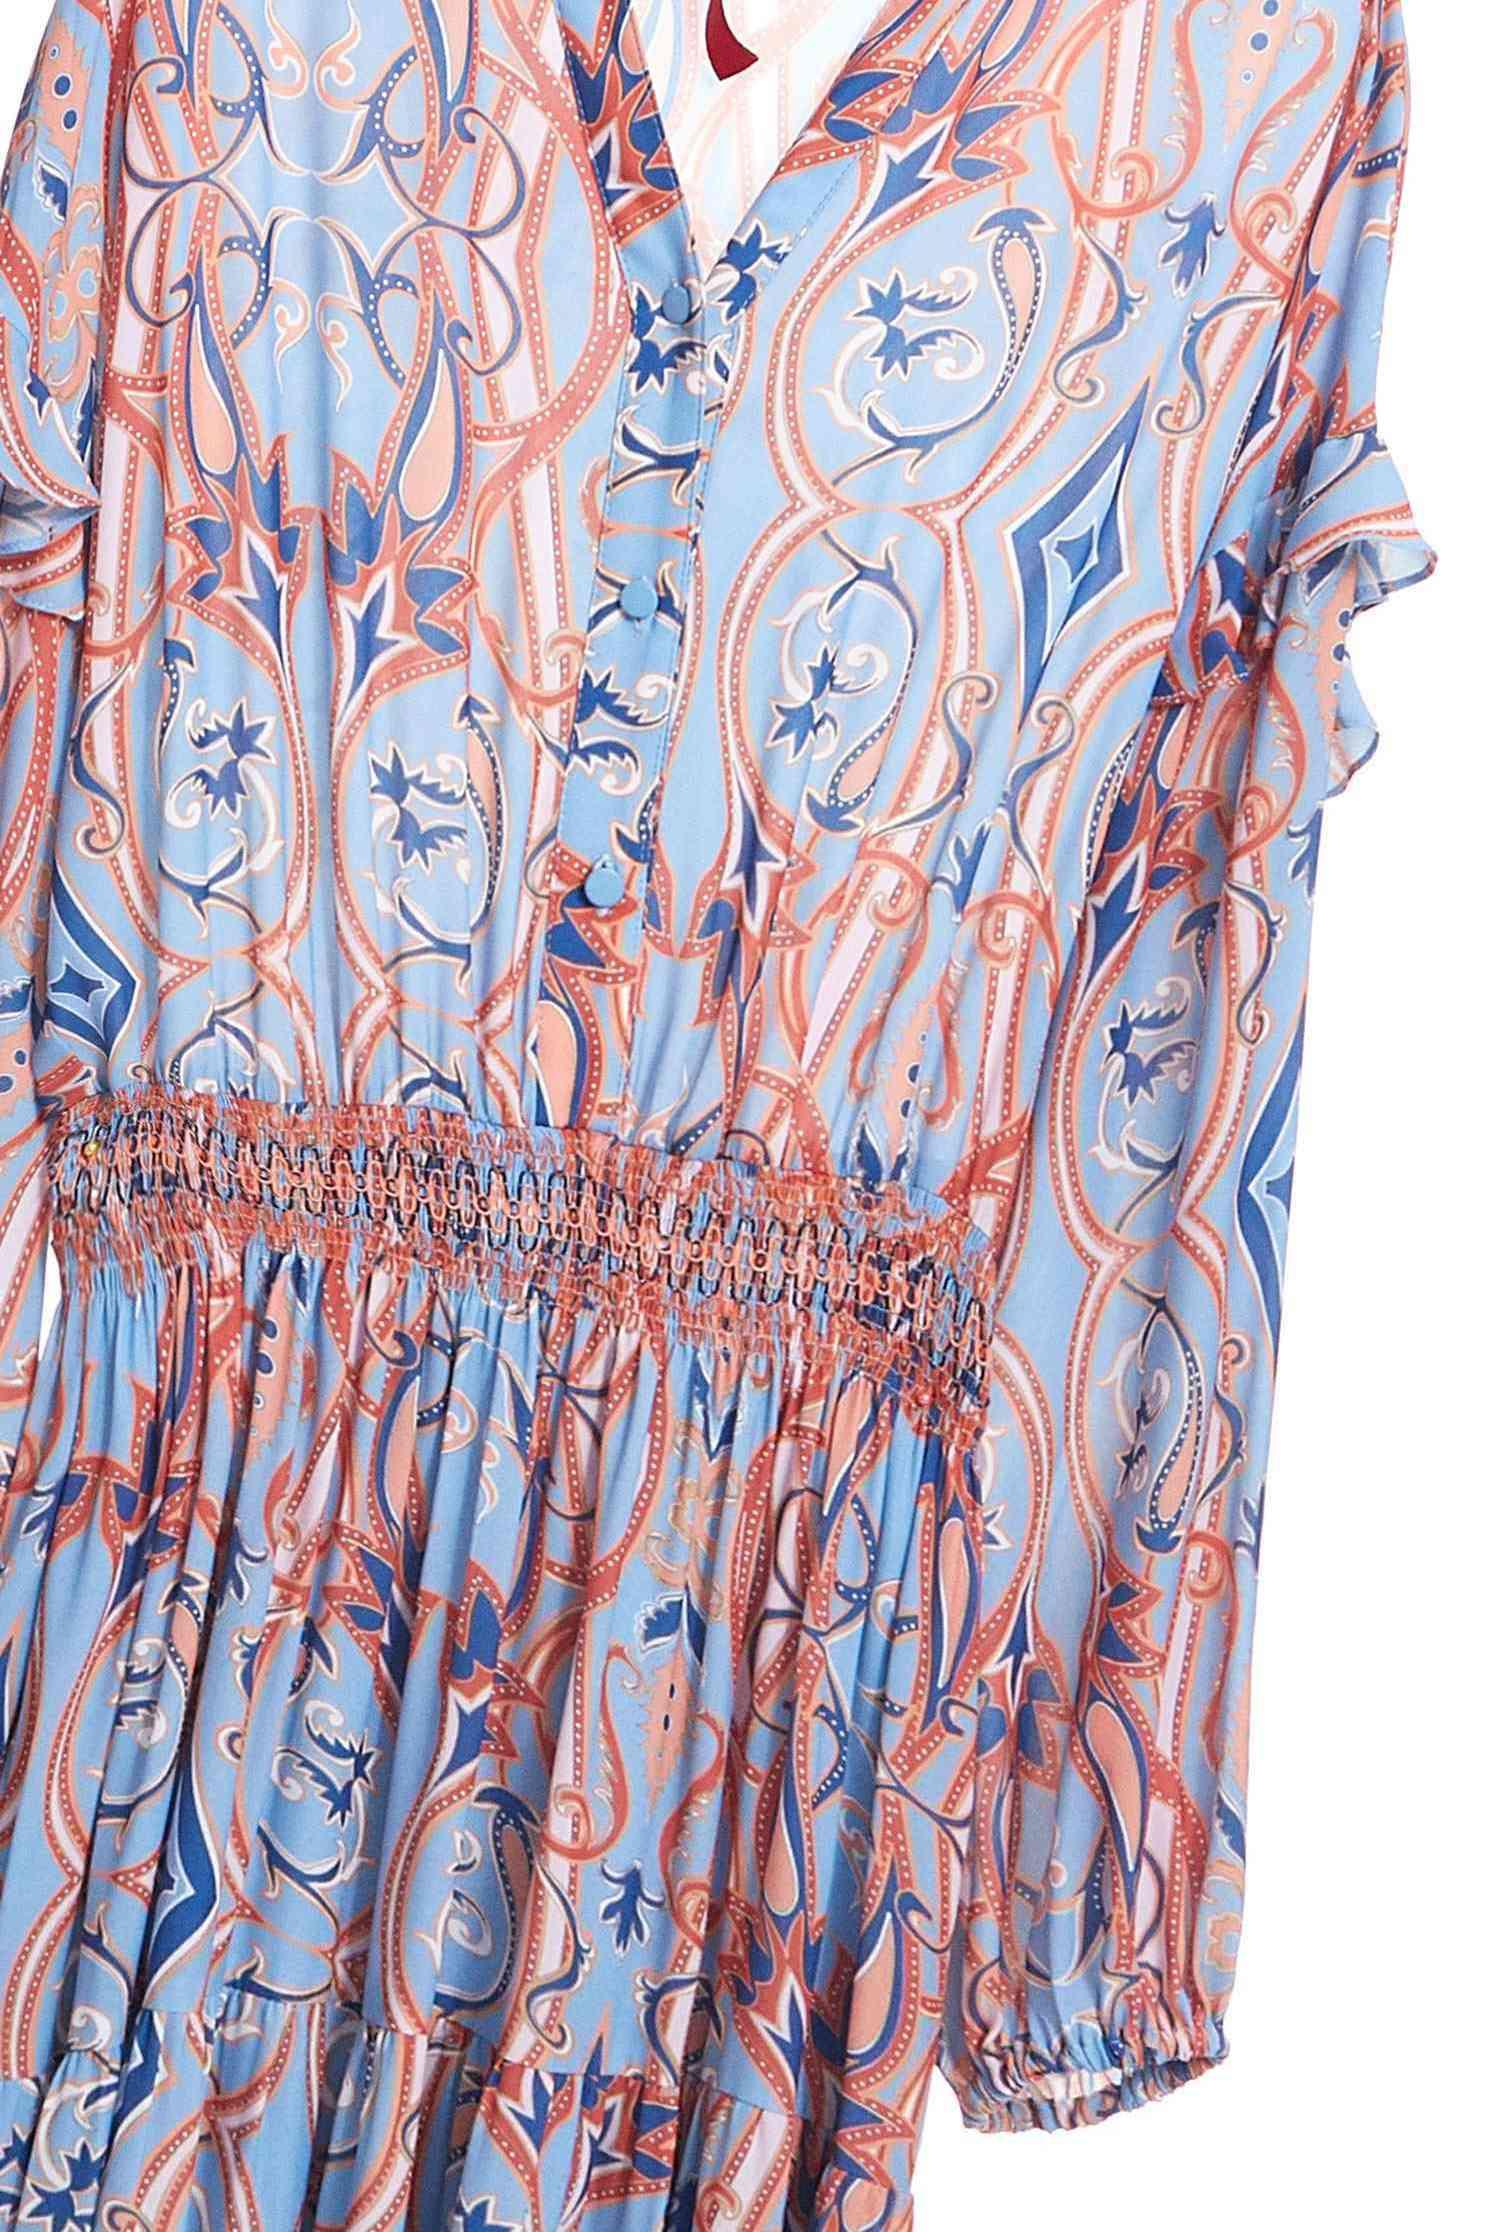 Printed street soft dress,v-neckdress,dress,printeddress,longdress,longsleevedress